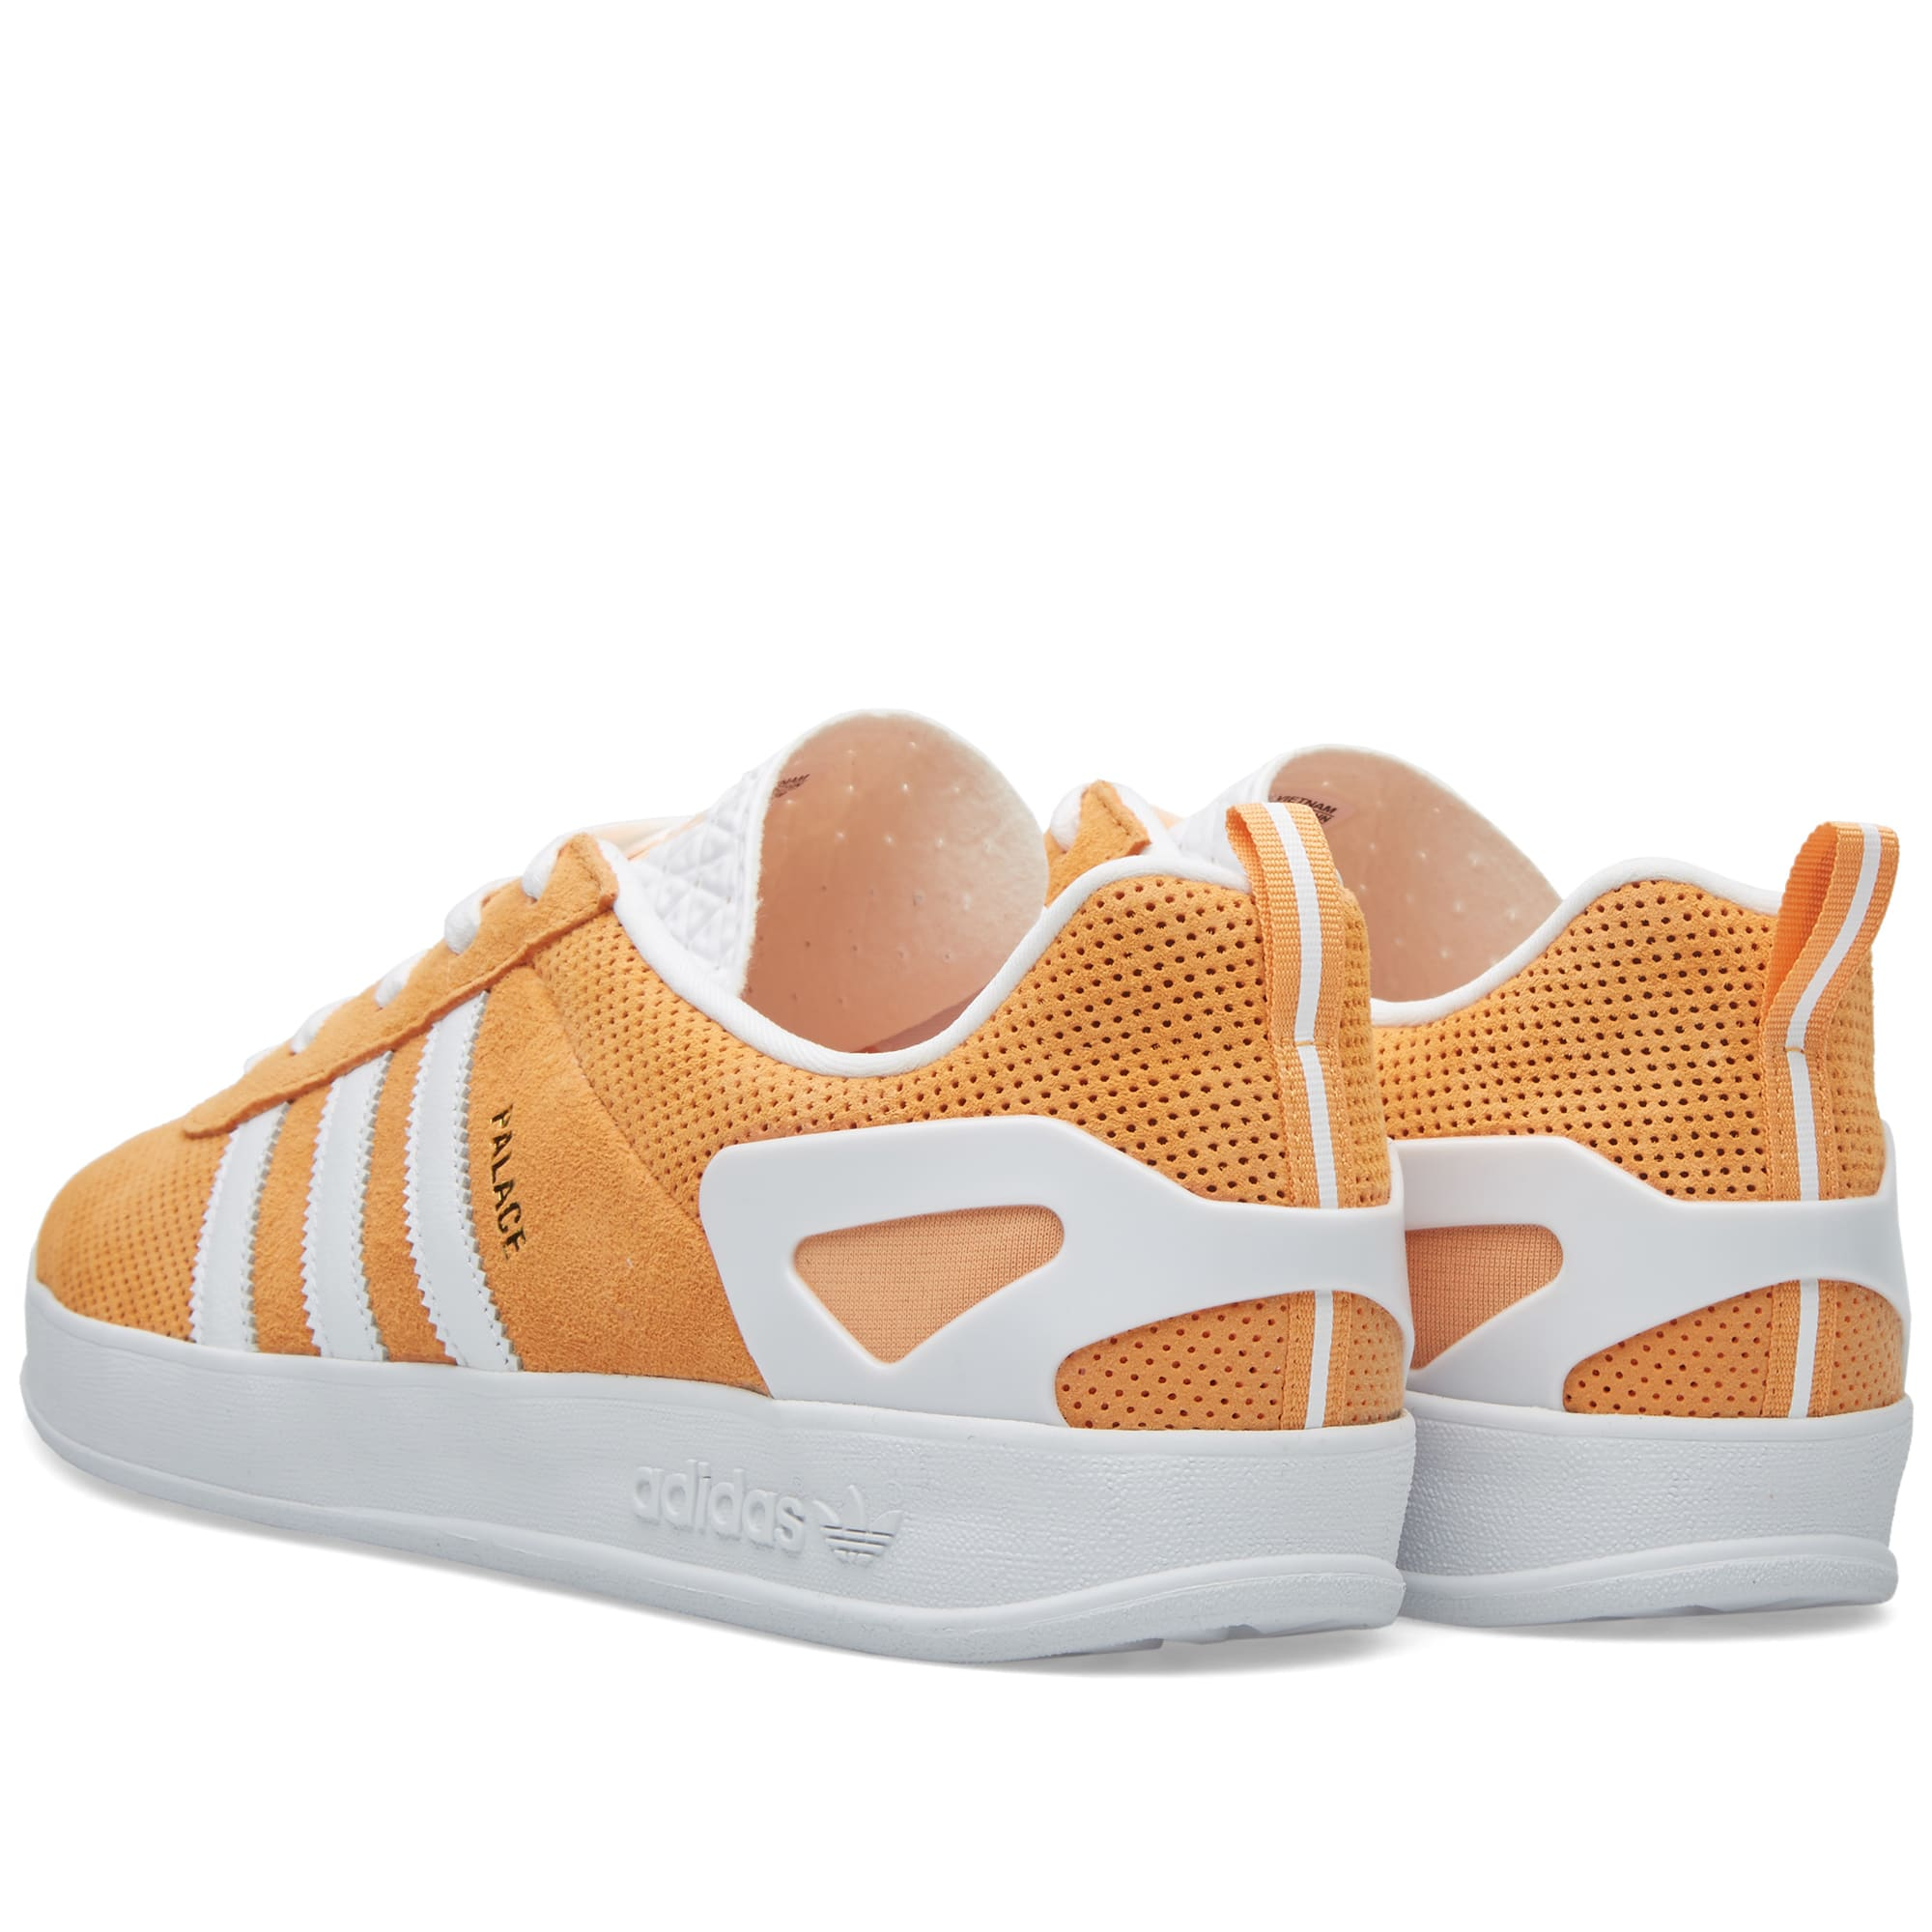 30003153 Adidas x Palace Pro Pumpkin & White | END.